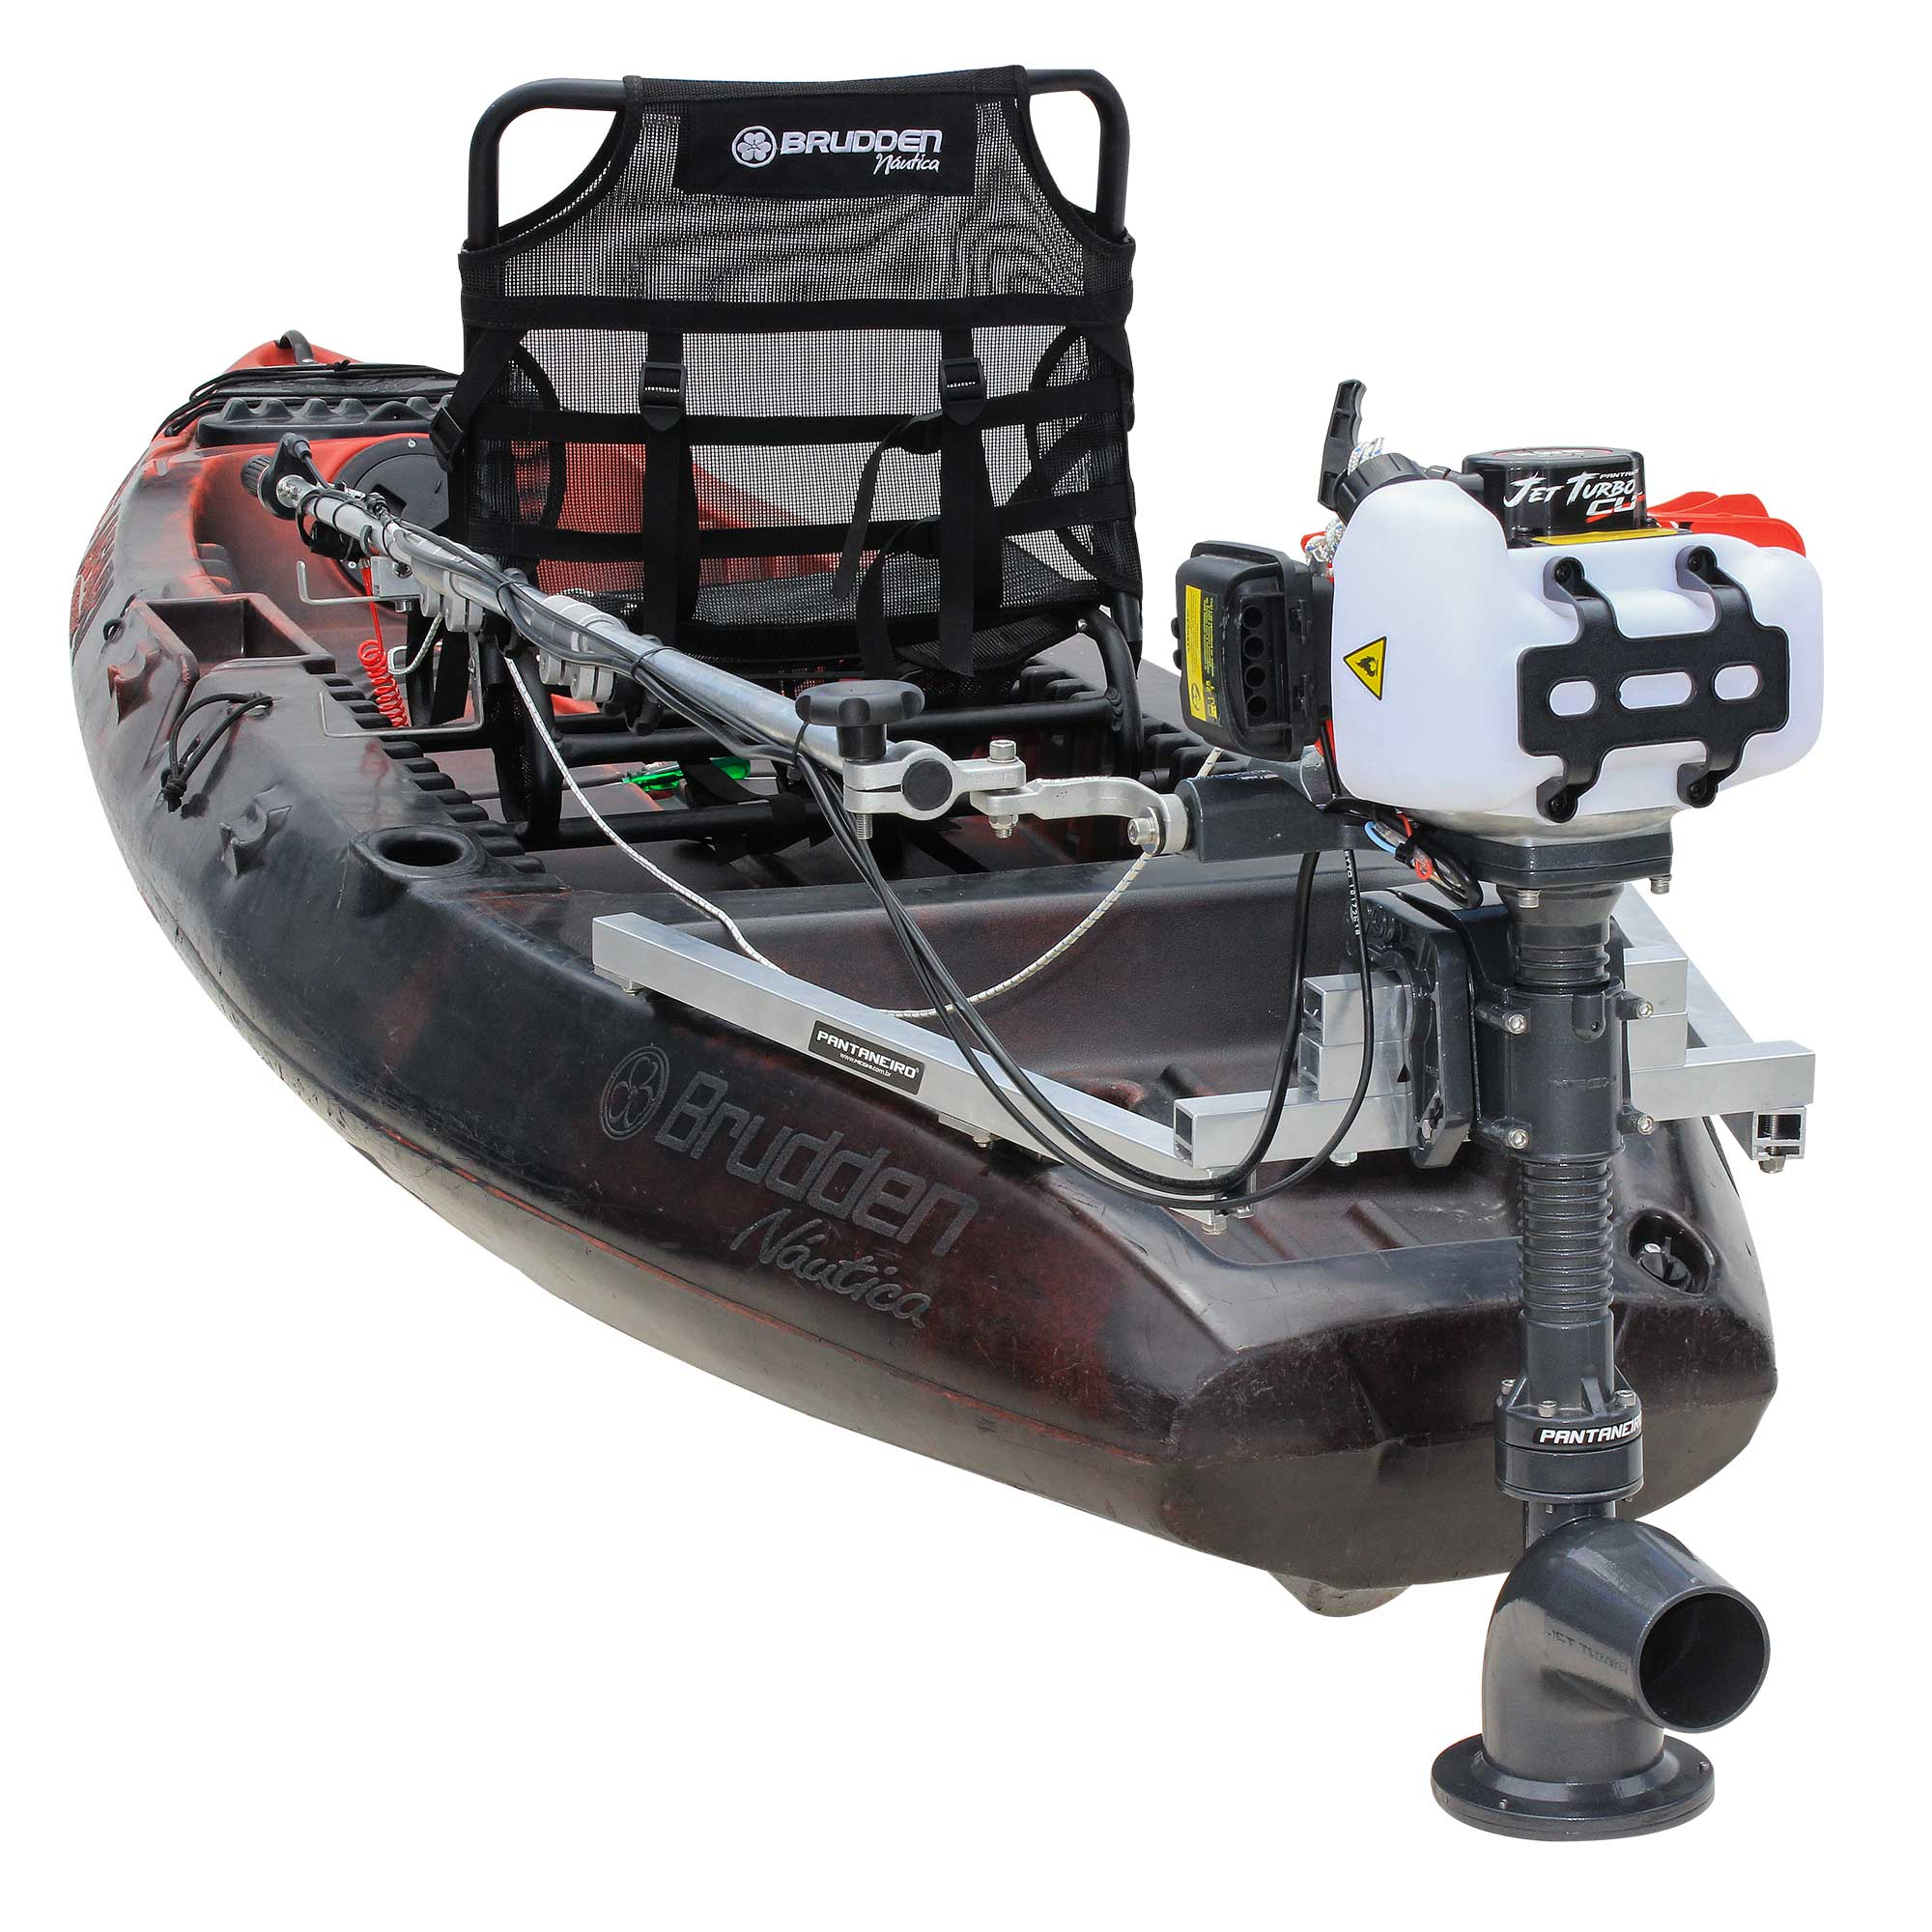 Kit Jet Turbo Cut Pantaneiro + acelerador remoto + Suporte traseiro Safari